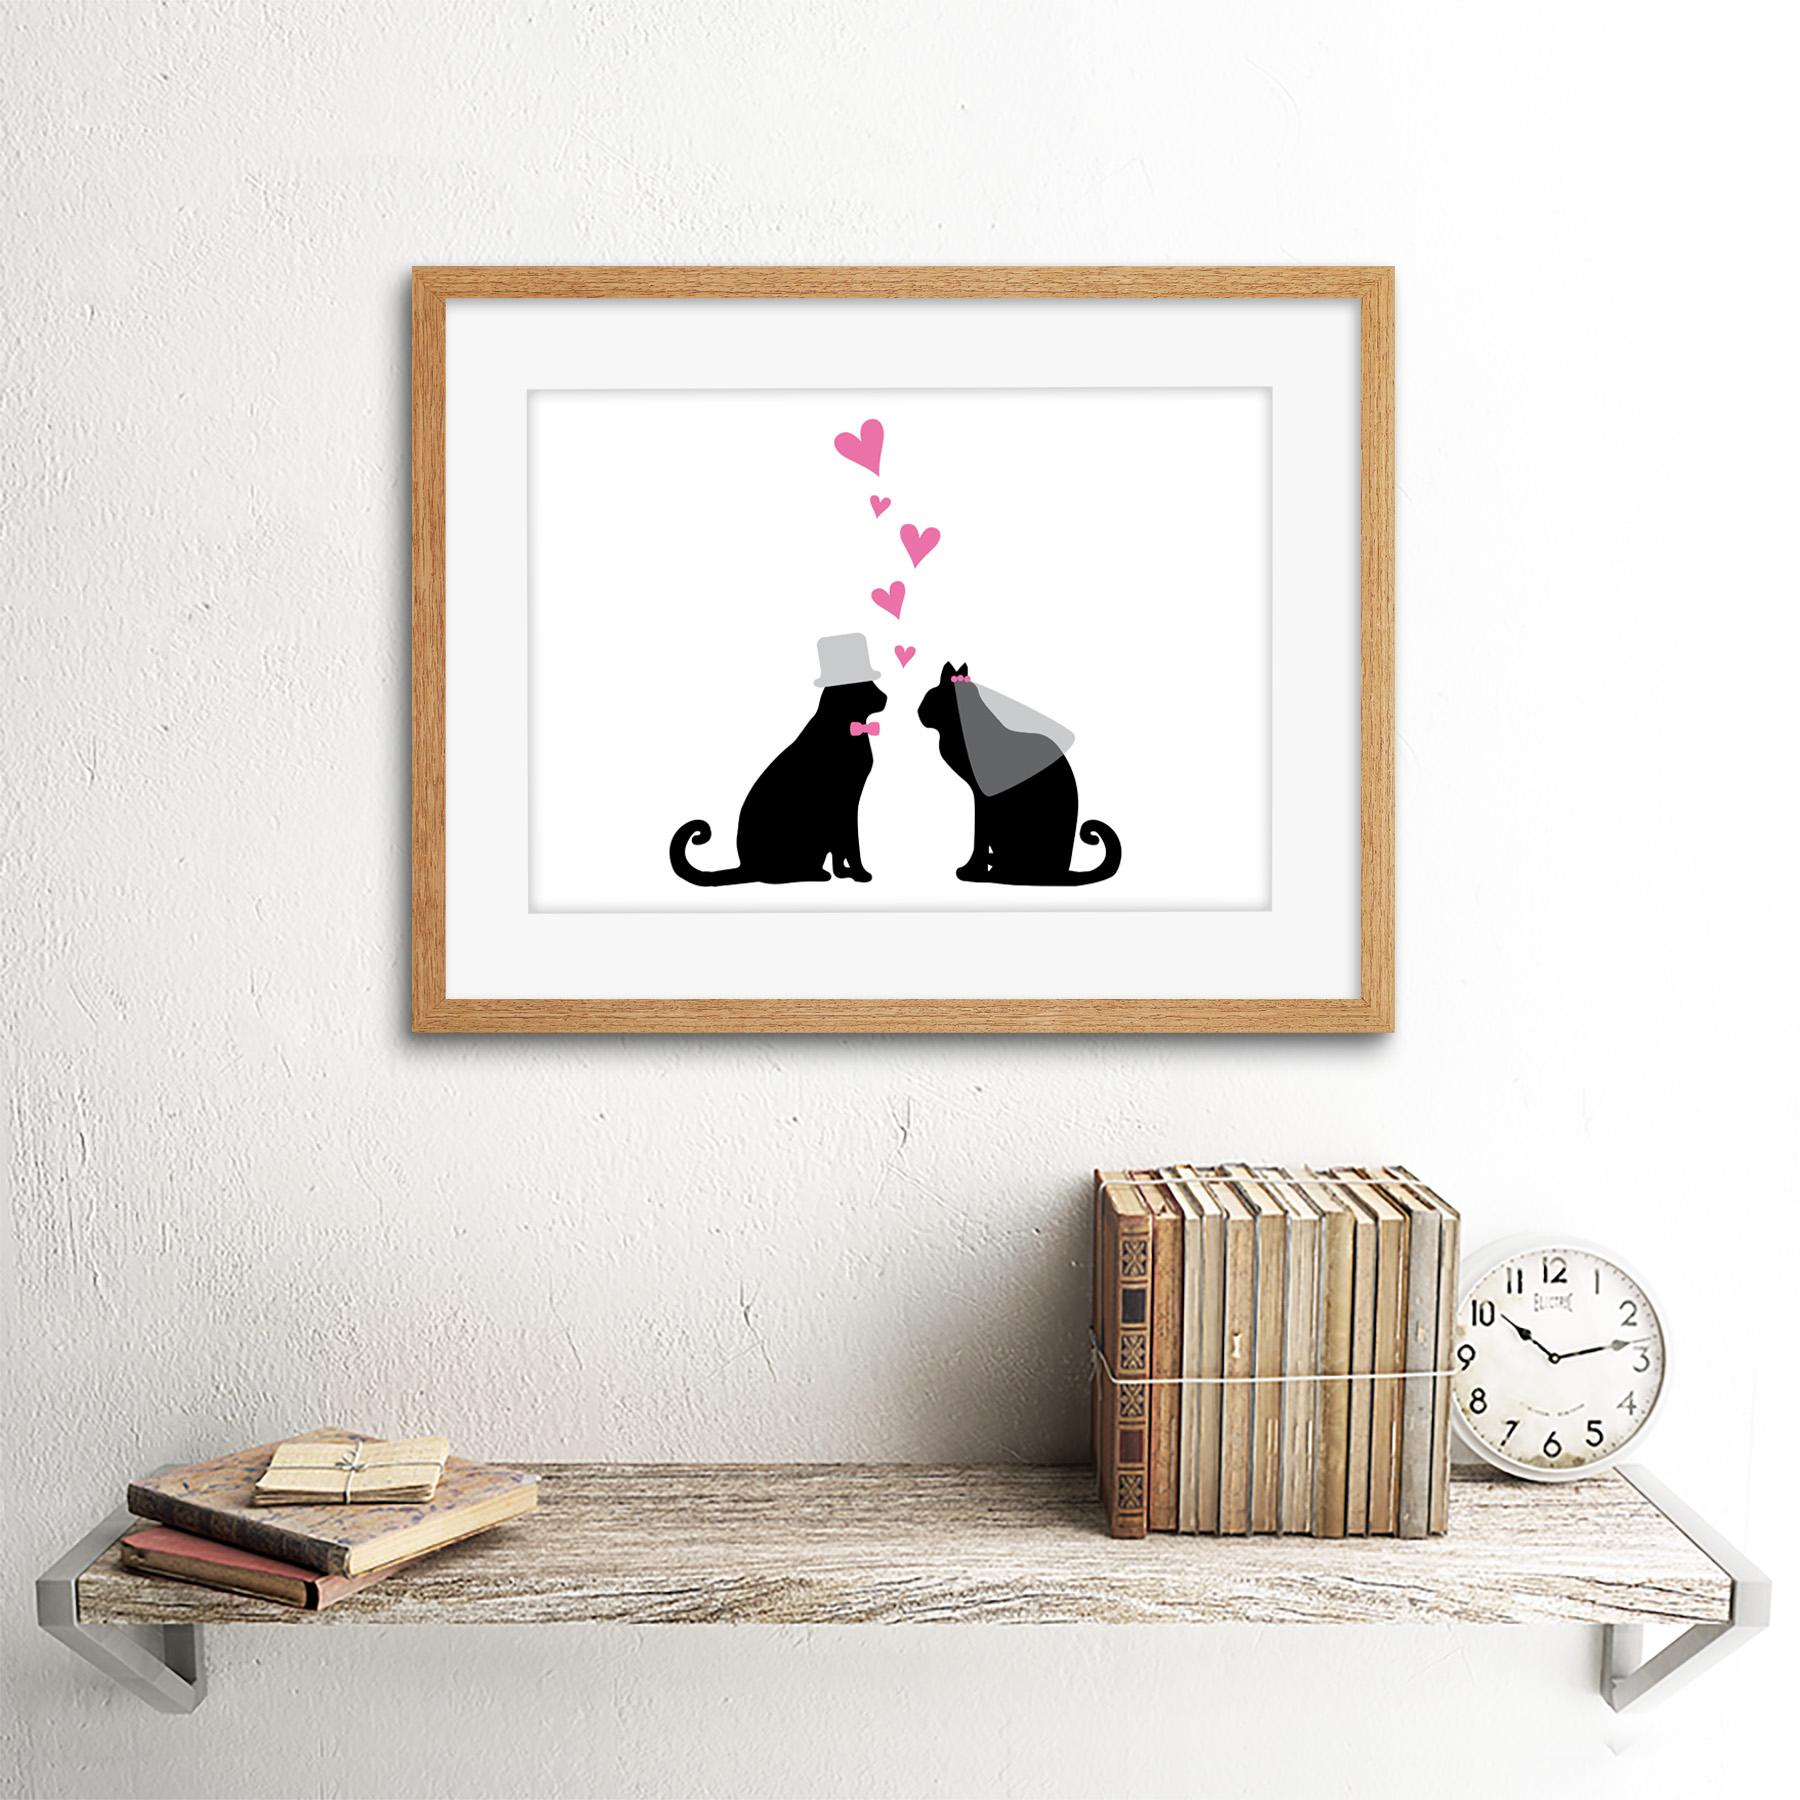 Matrimonio Boda Amor Pareja De Gatos Impresión Arte Enmarcado 12x16 pulgadas